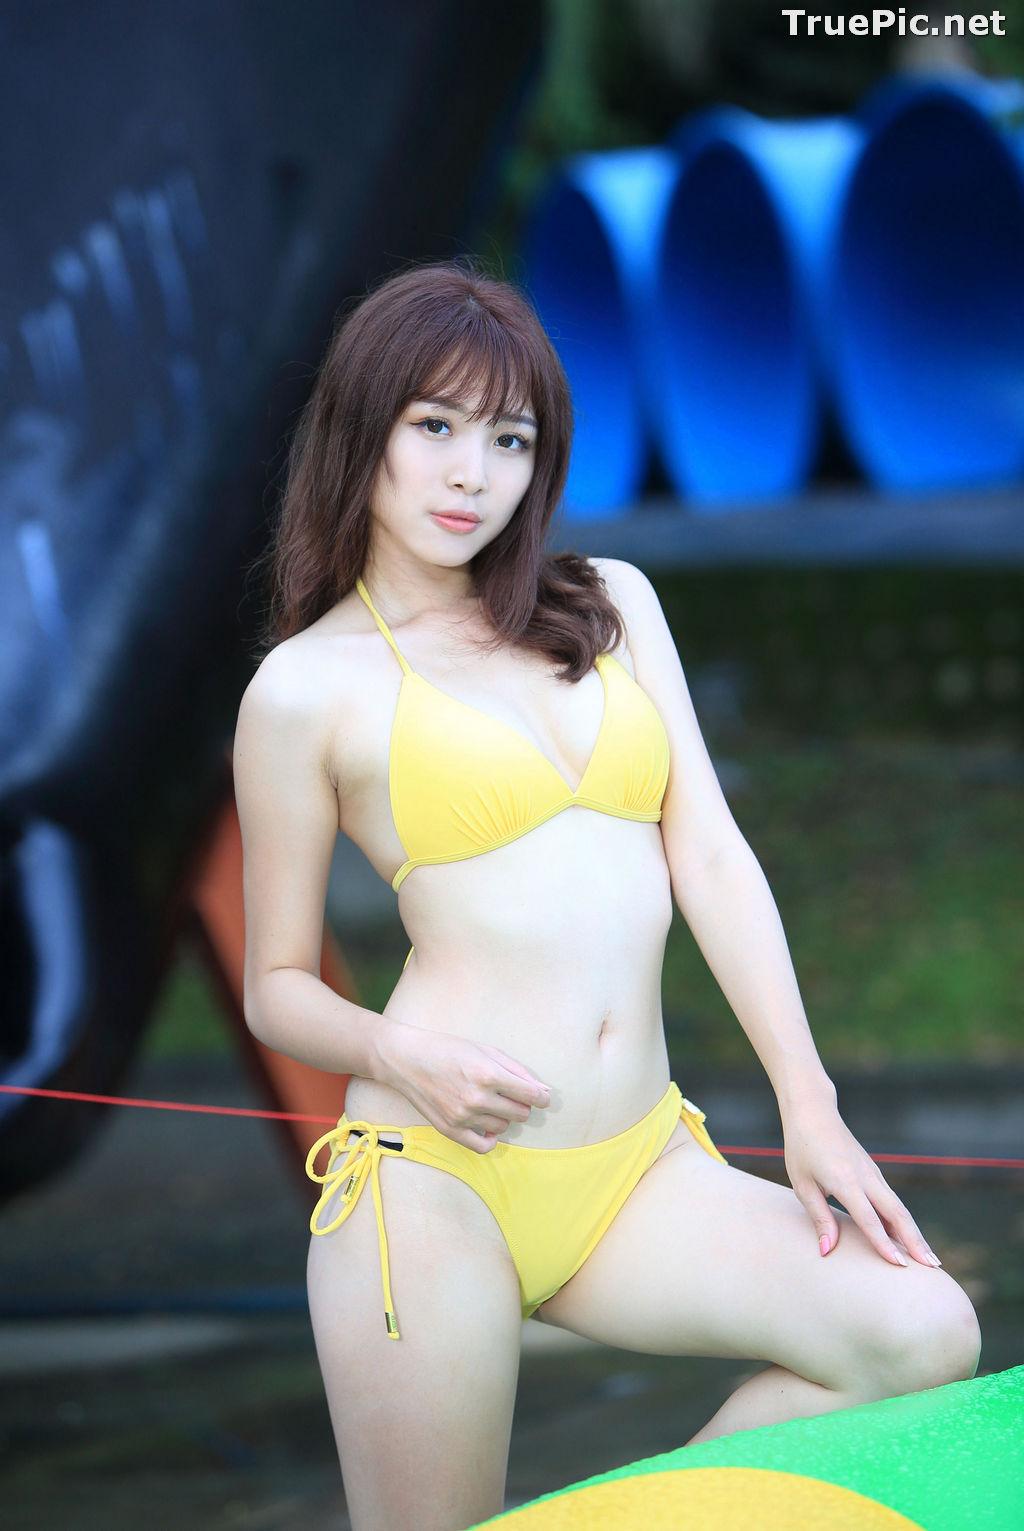 Image Taiwanese Model - Ash Ley - Yellow Bikini at Taipei Water Museum - TruePic.net - Picture-30